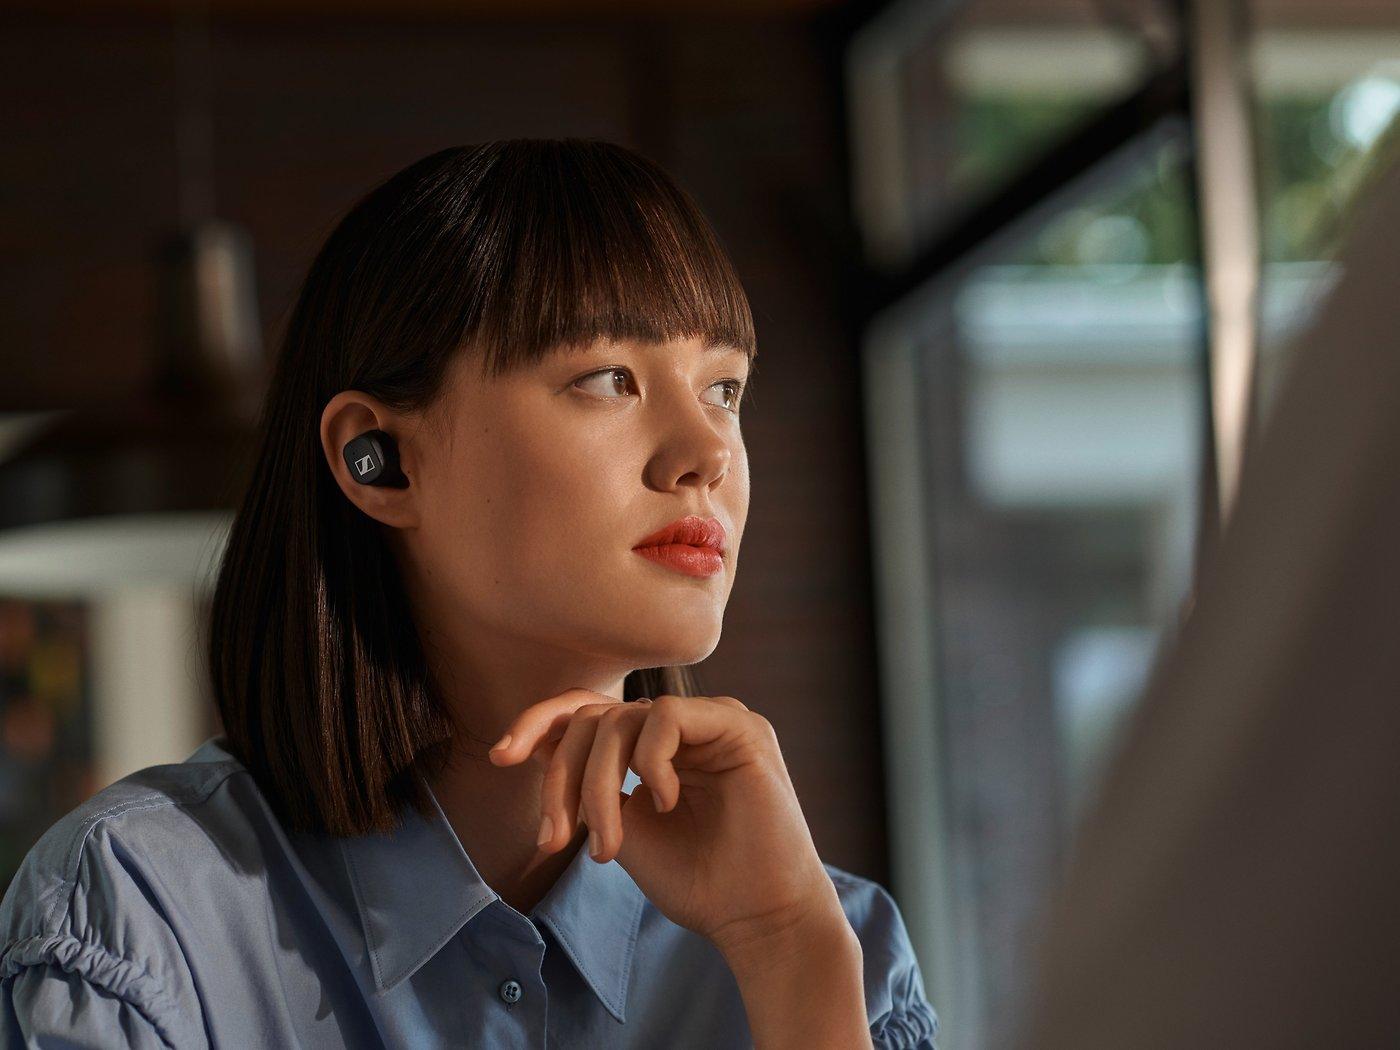 Sennheiser presents new affordable true wireless headphones | NextPit